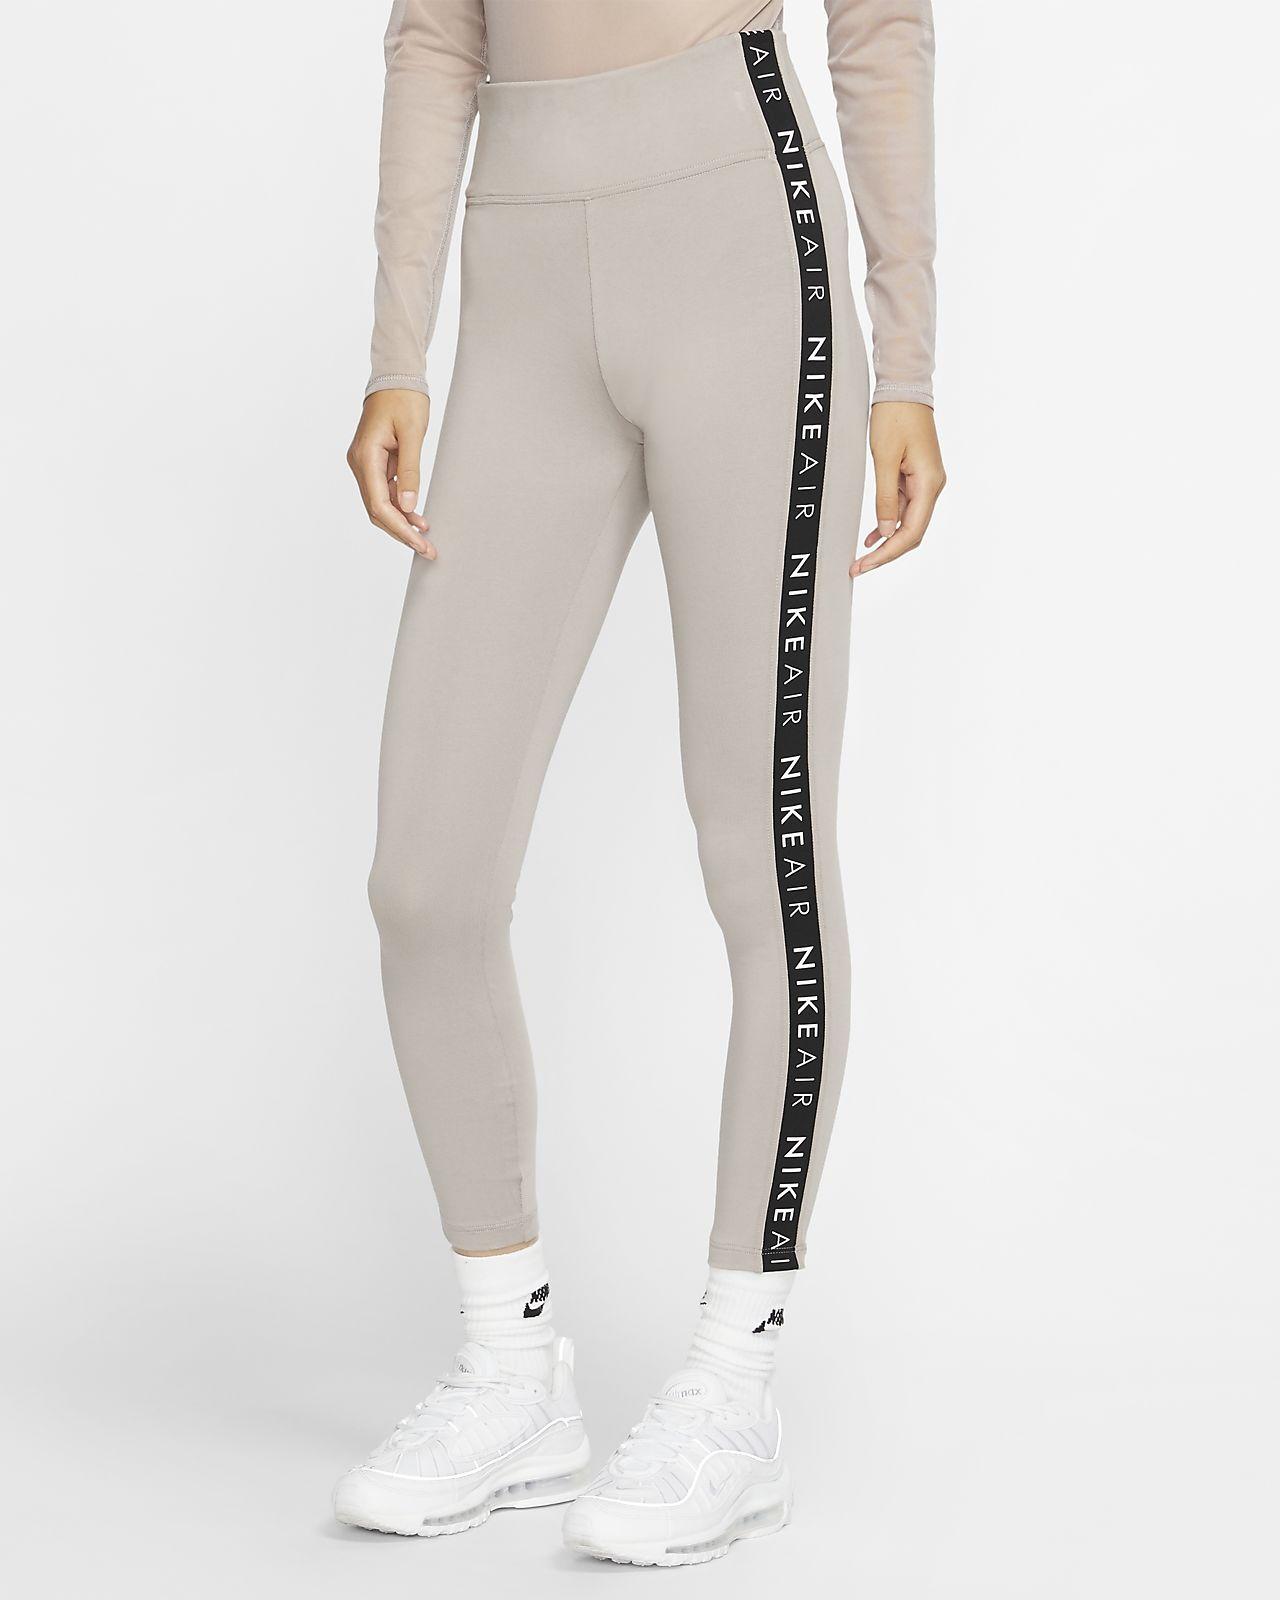 Collant Nike Air pour Femme